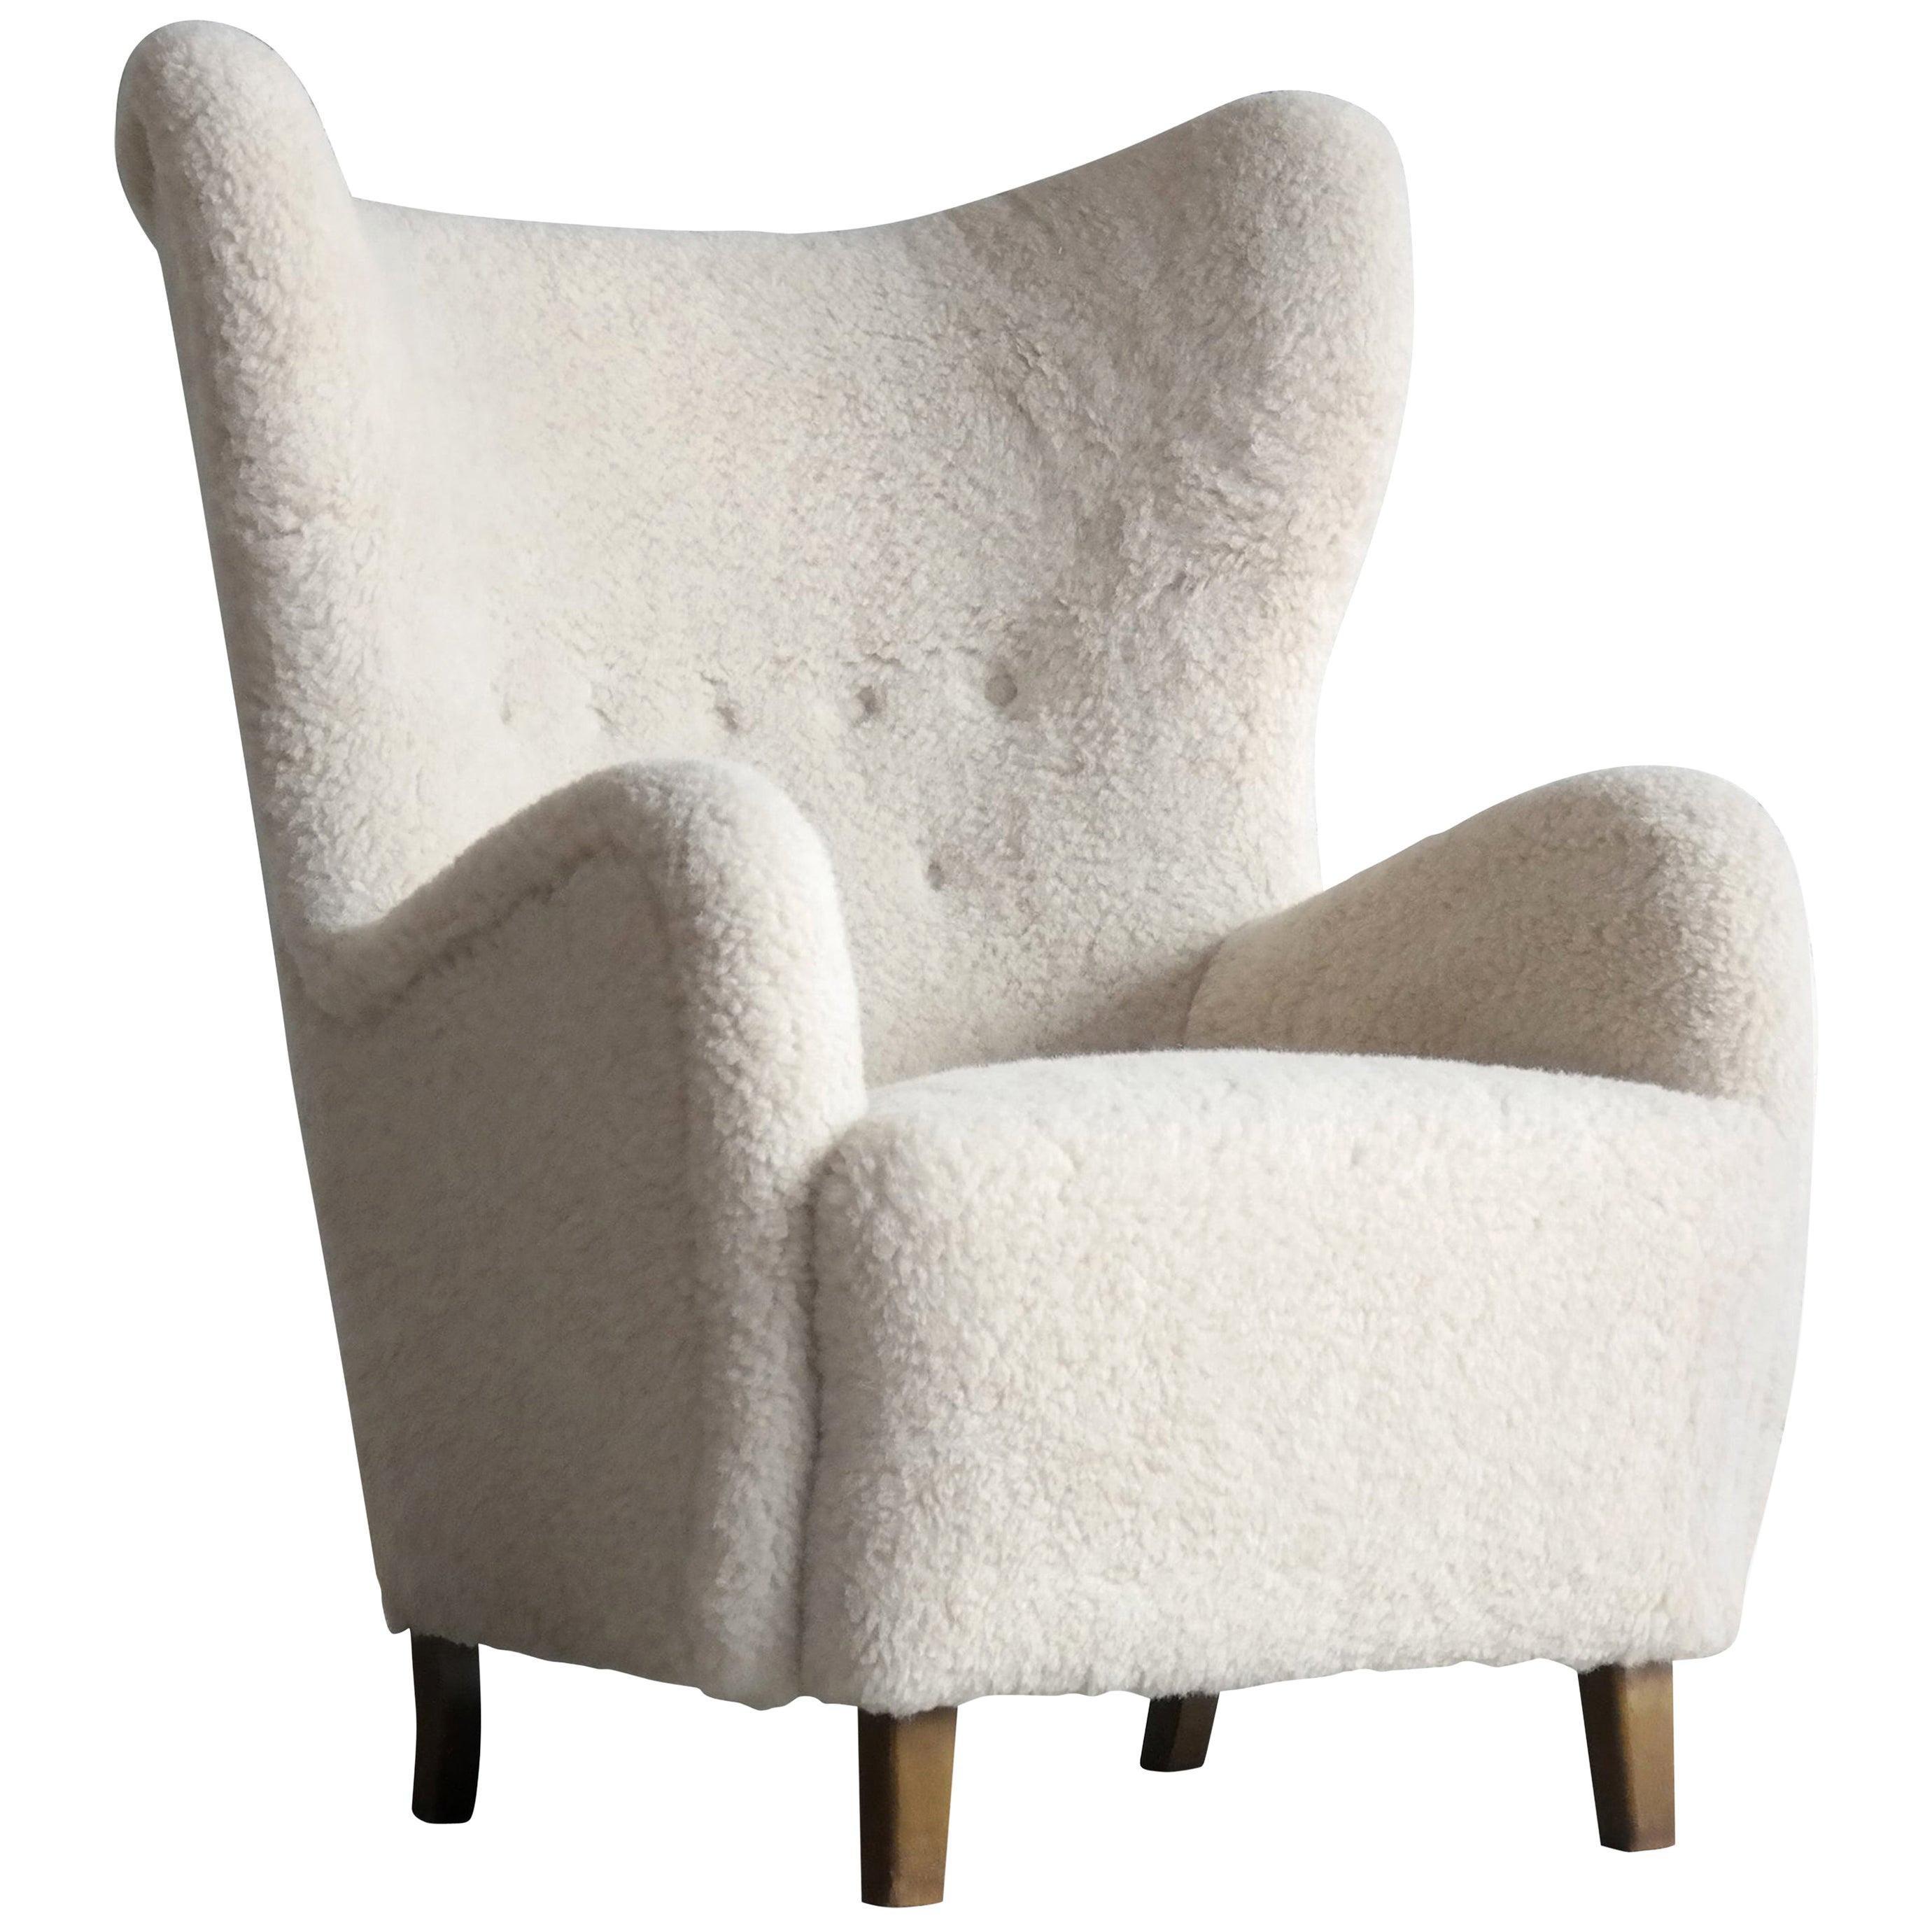 Flemming Lassen 1940s High Back Lounge Chair in Lambswool Danish, Midcentury